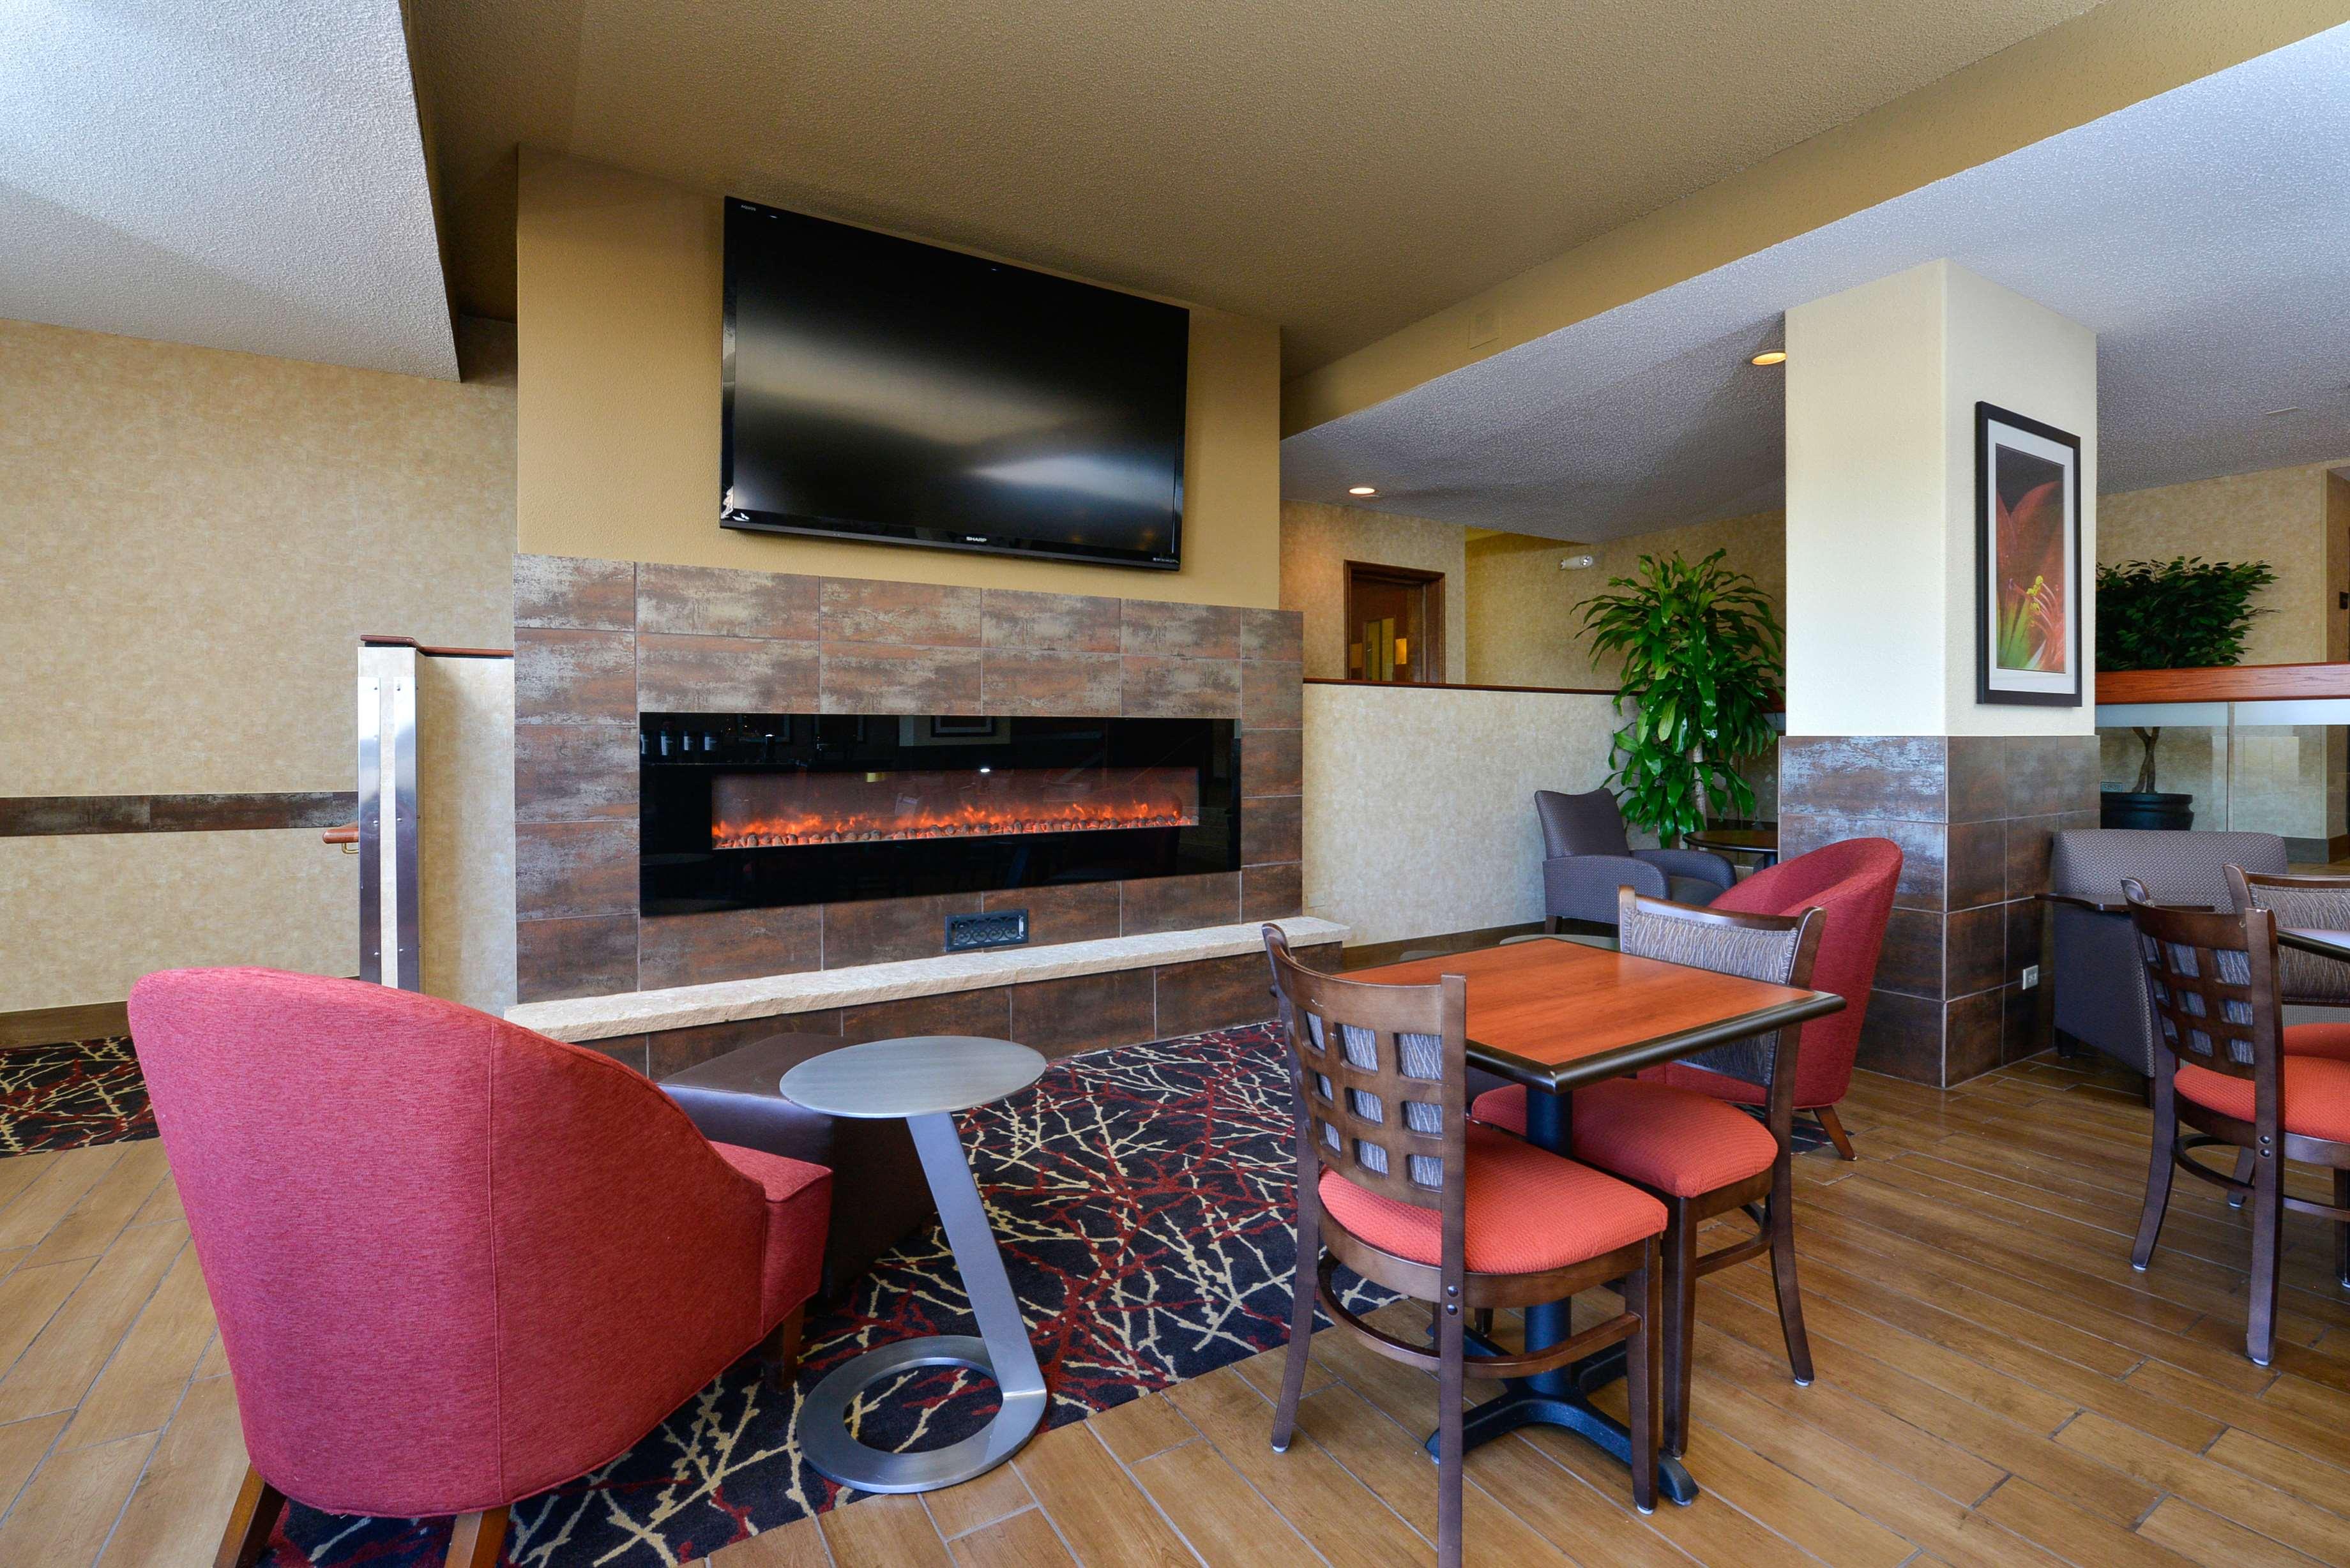 Best Western Plus Denver Tech Center Hotel image 19